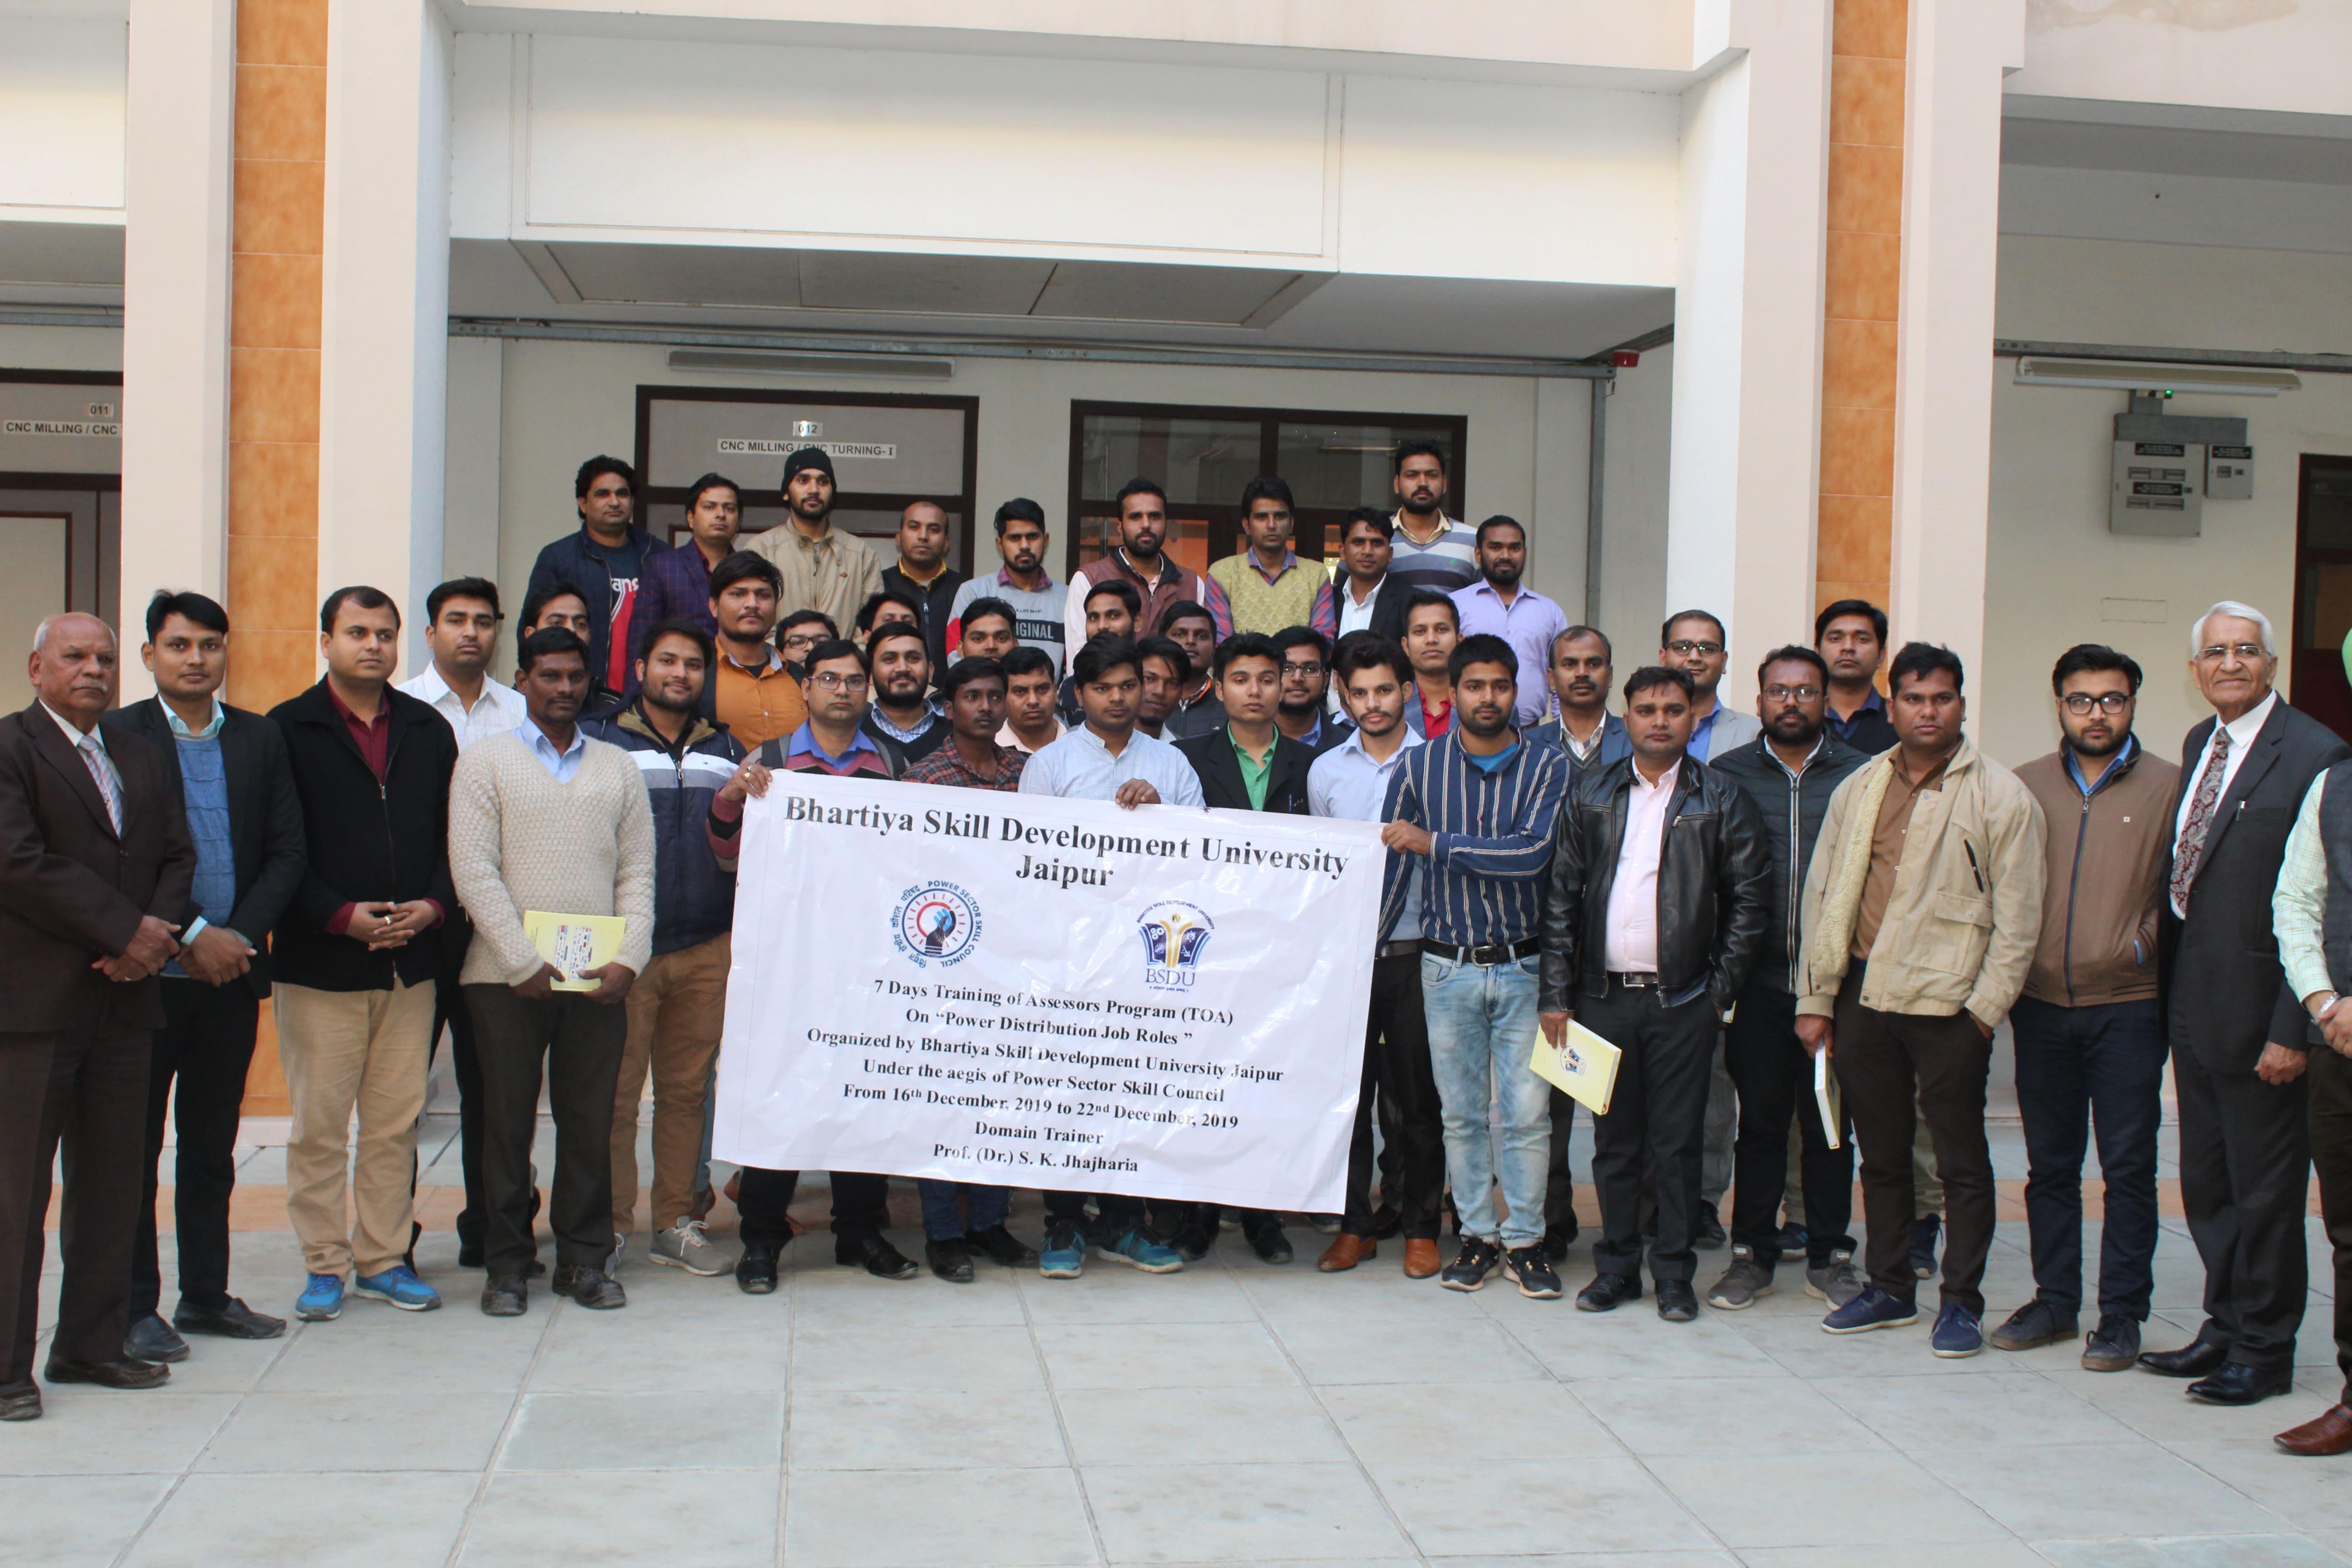 7 Day Training of Assessors Program on Power Distribution Job Roles